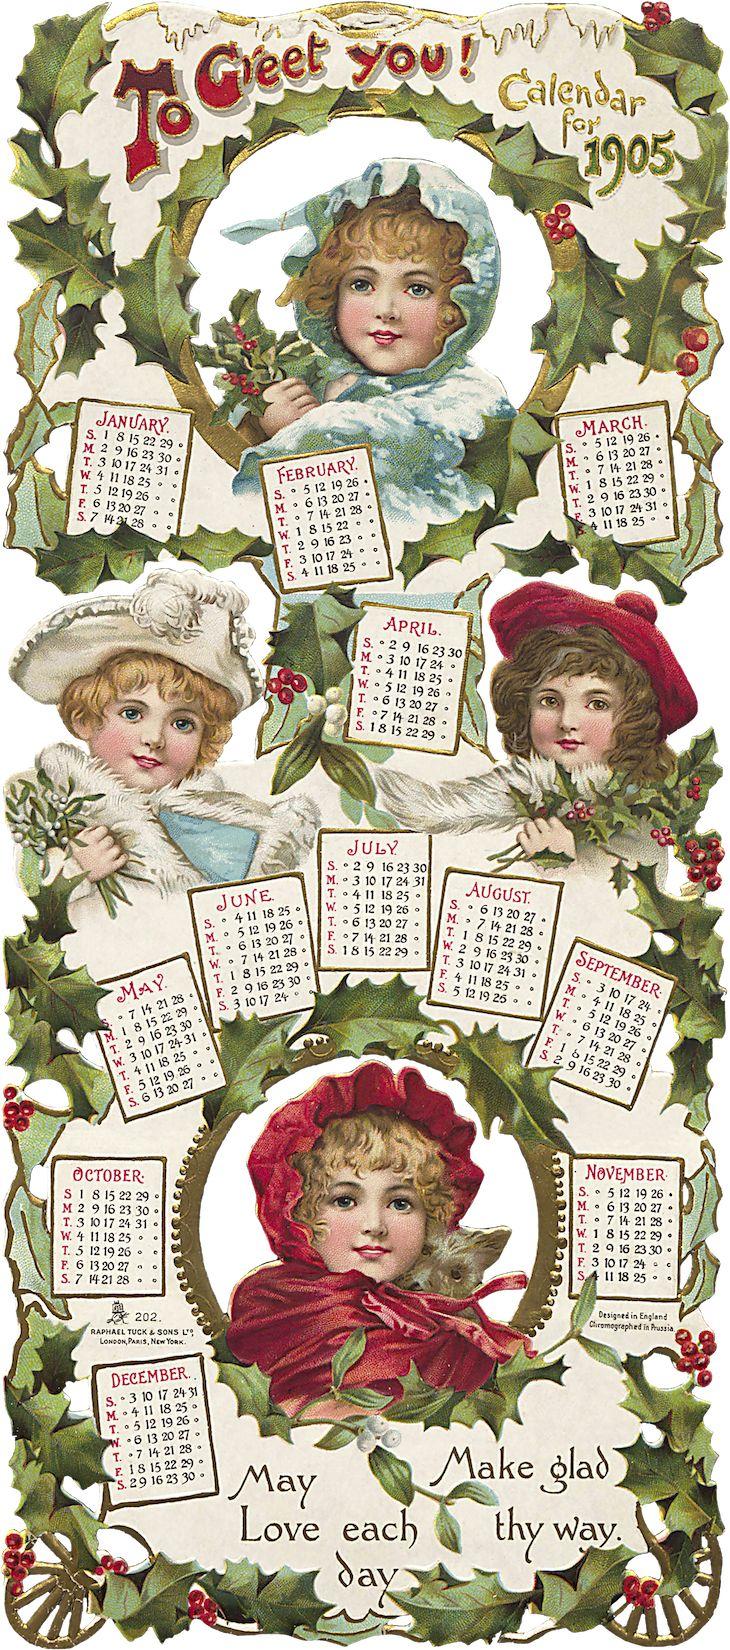 Wings of Whimsy: To Greet You Christmas Calendar 1905 #vintage #ephemera #freebie #printable #calendar